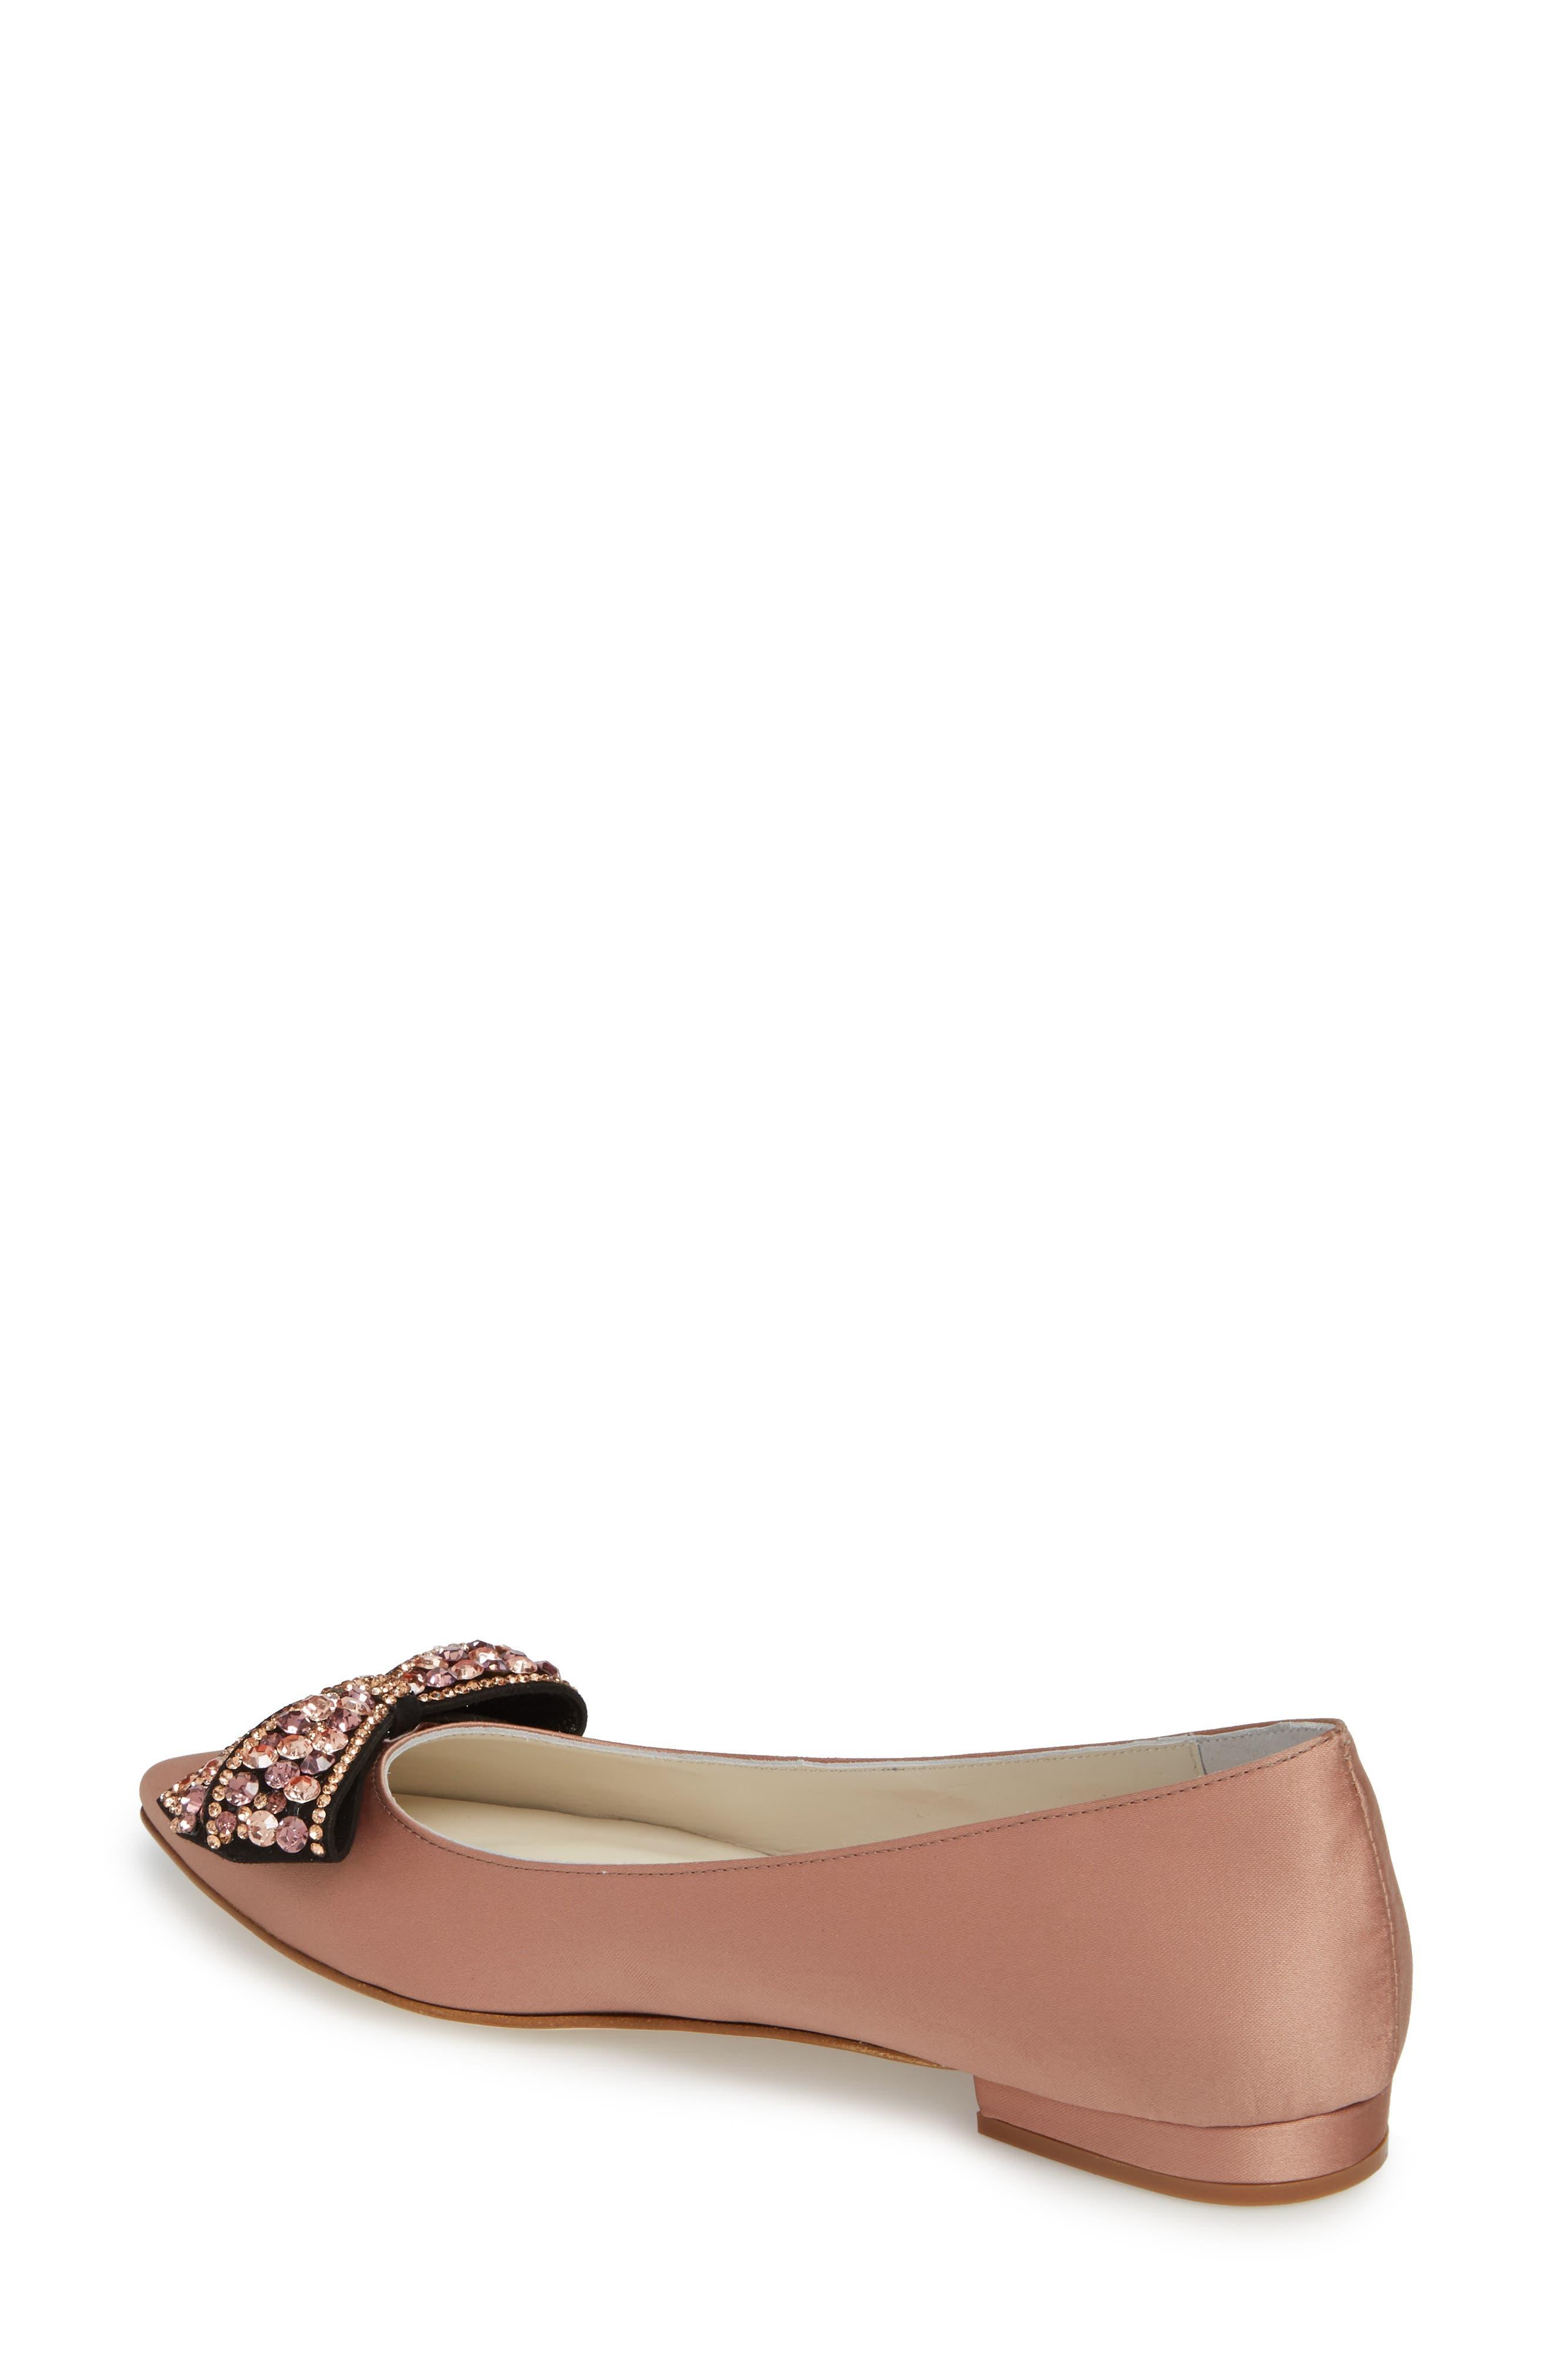 Milva Embellished Bow Pointy Toe Flat,                             Alternate thumbnail 2, color,                             Blush Satin